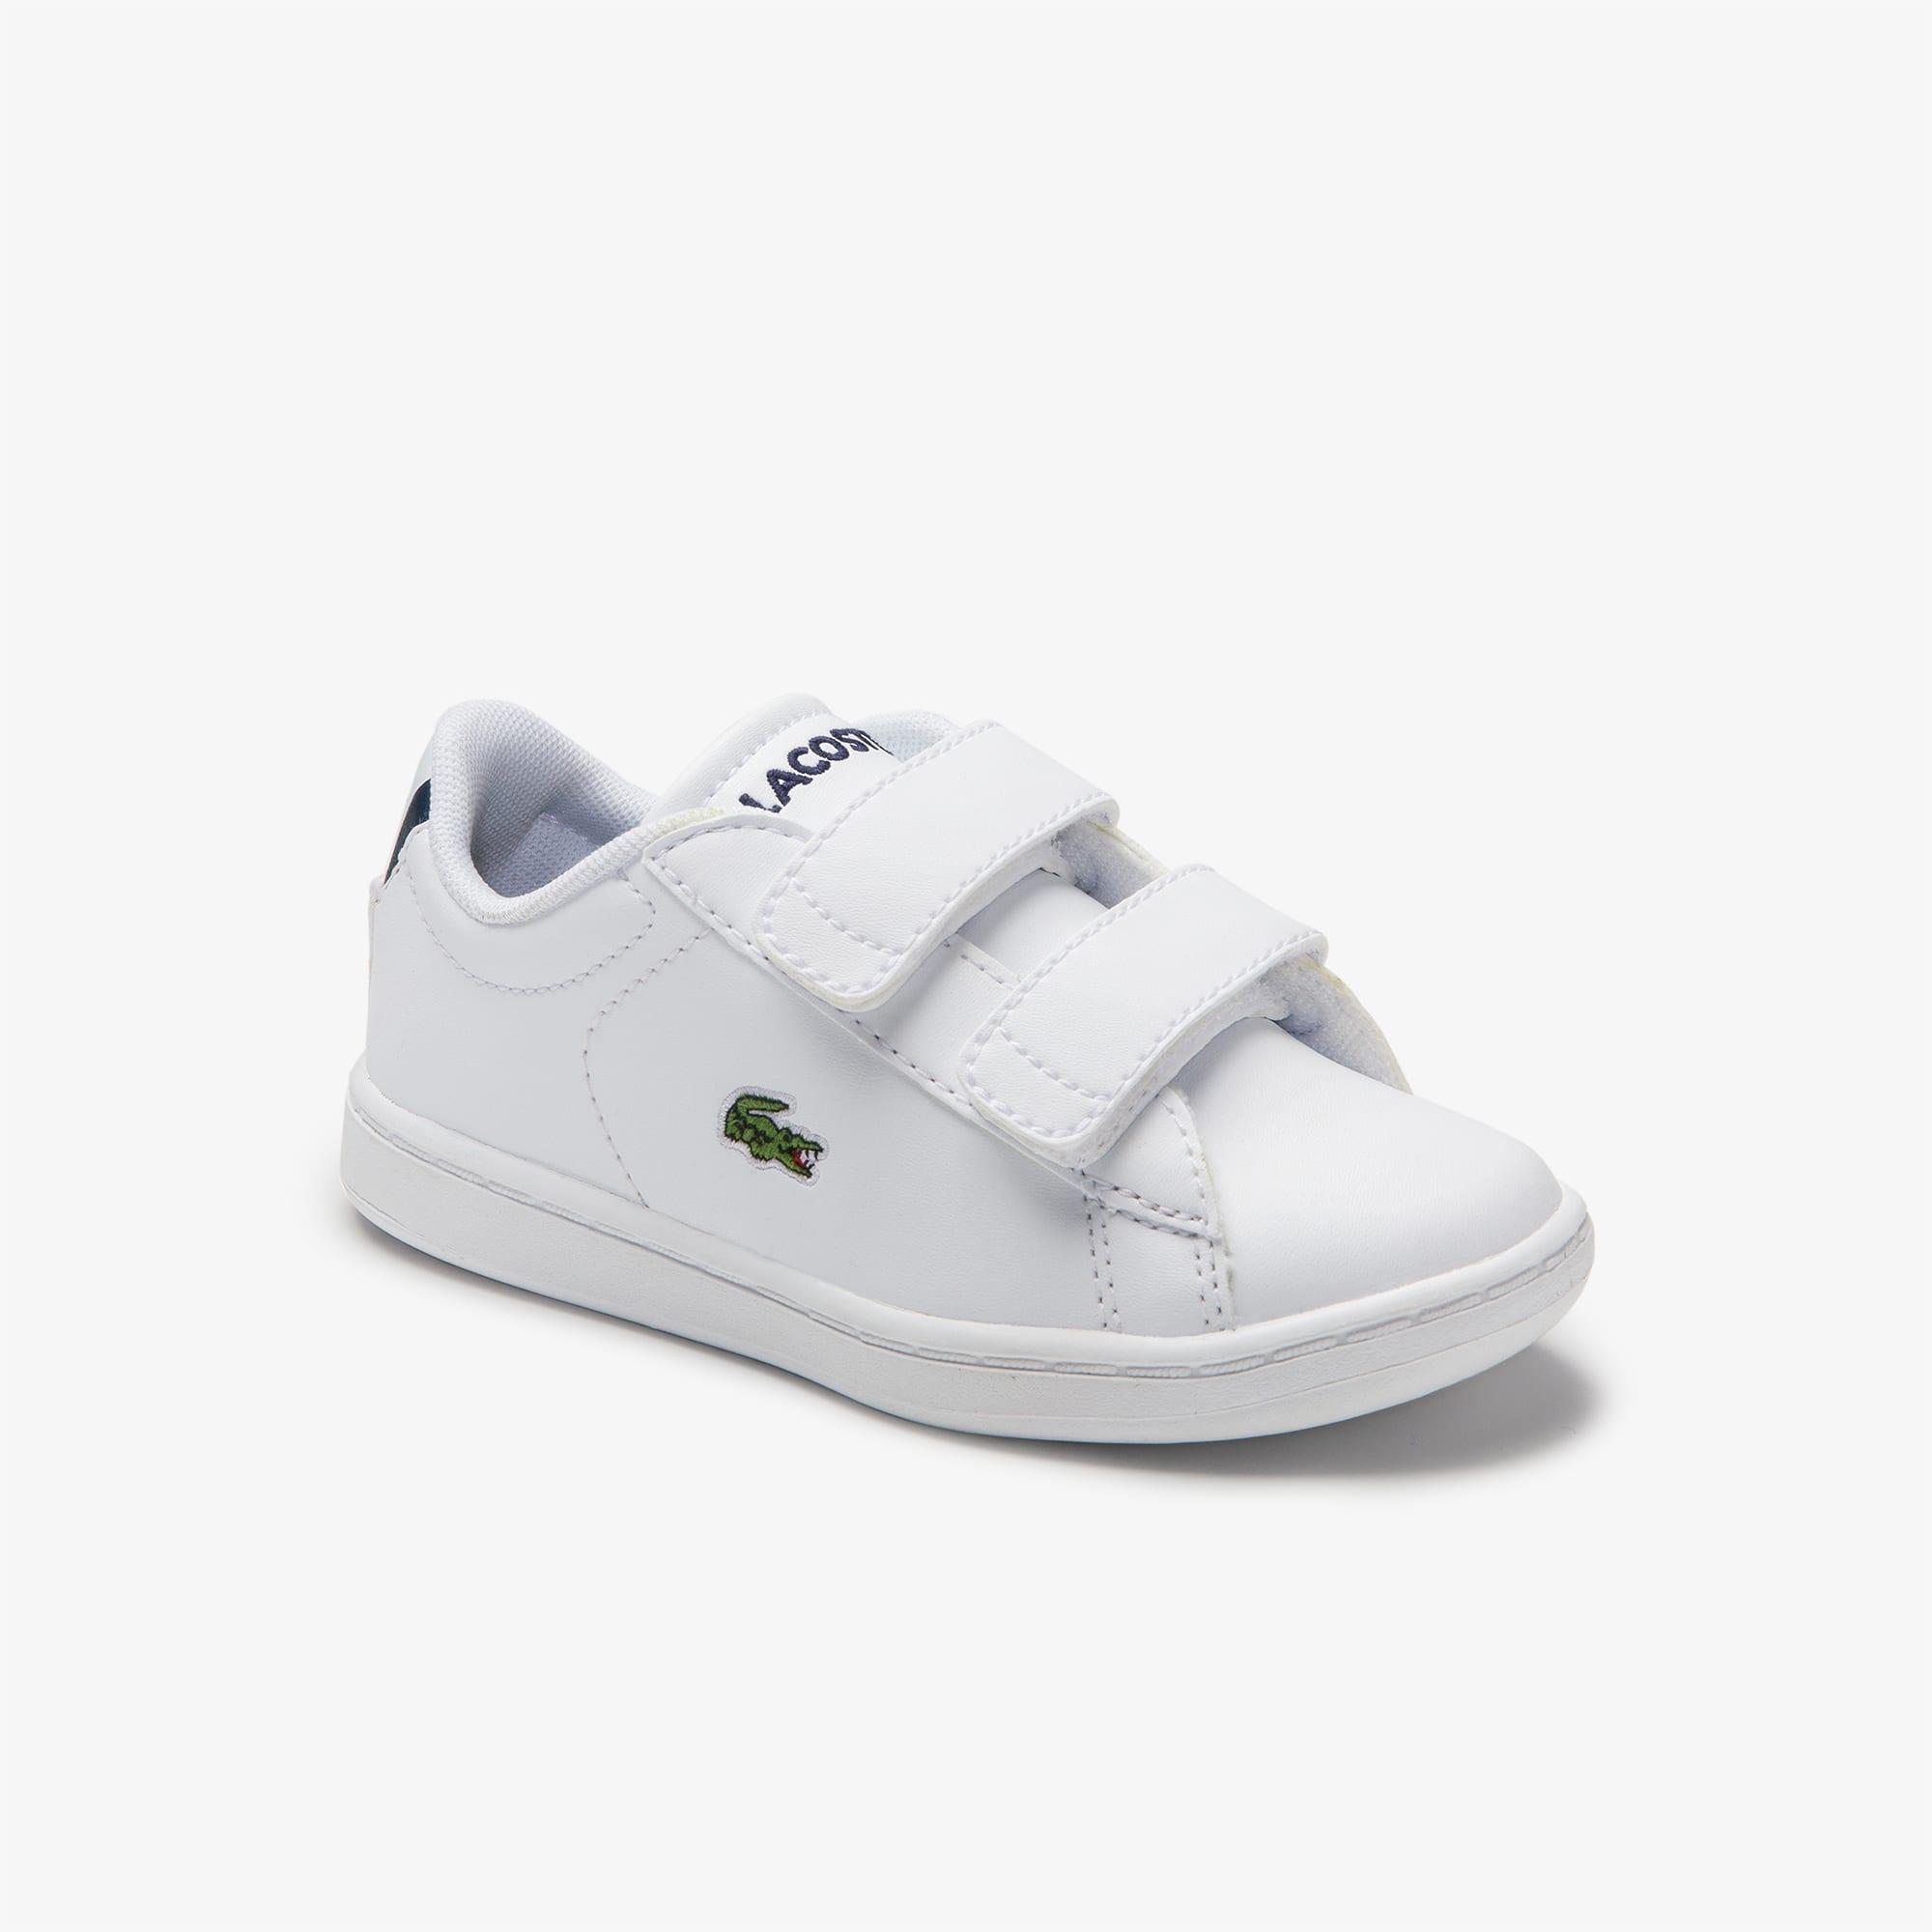 dfe5a3df6 حذاء رياضي مصنوع من مواد صناعية للأطفال الصغار من مجموعة Carnaby Evo BL |  LACOSTE